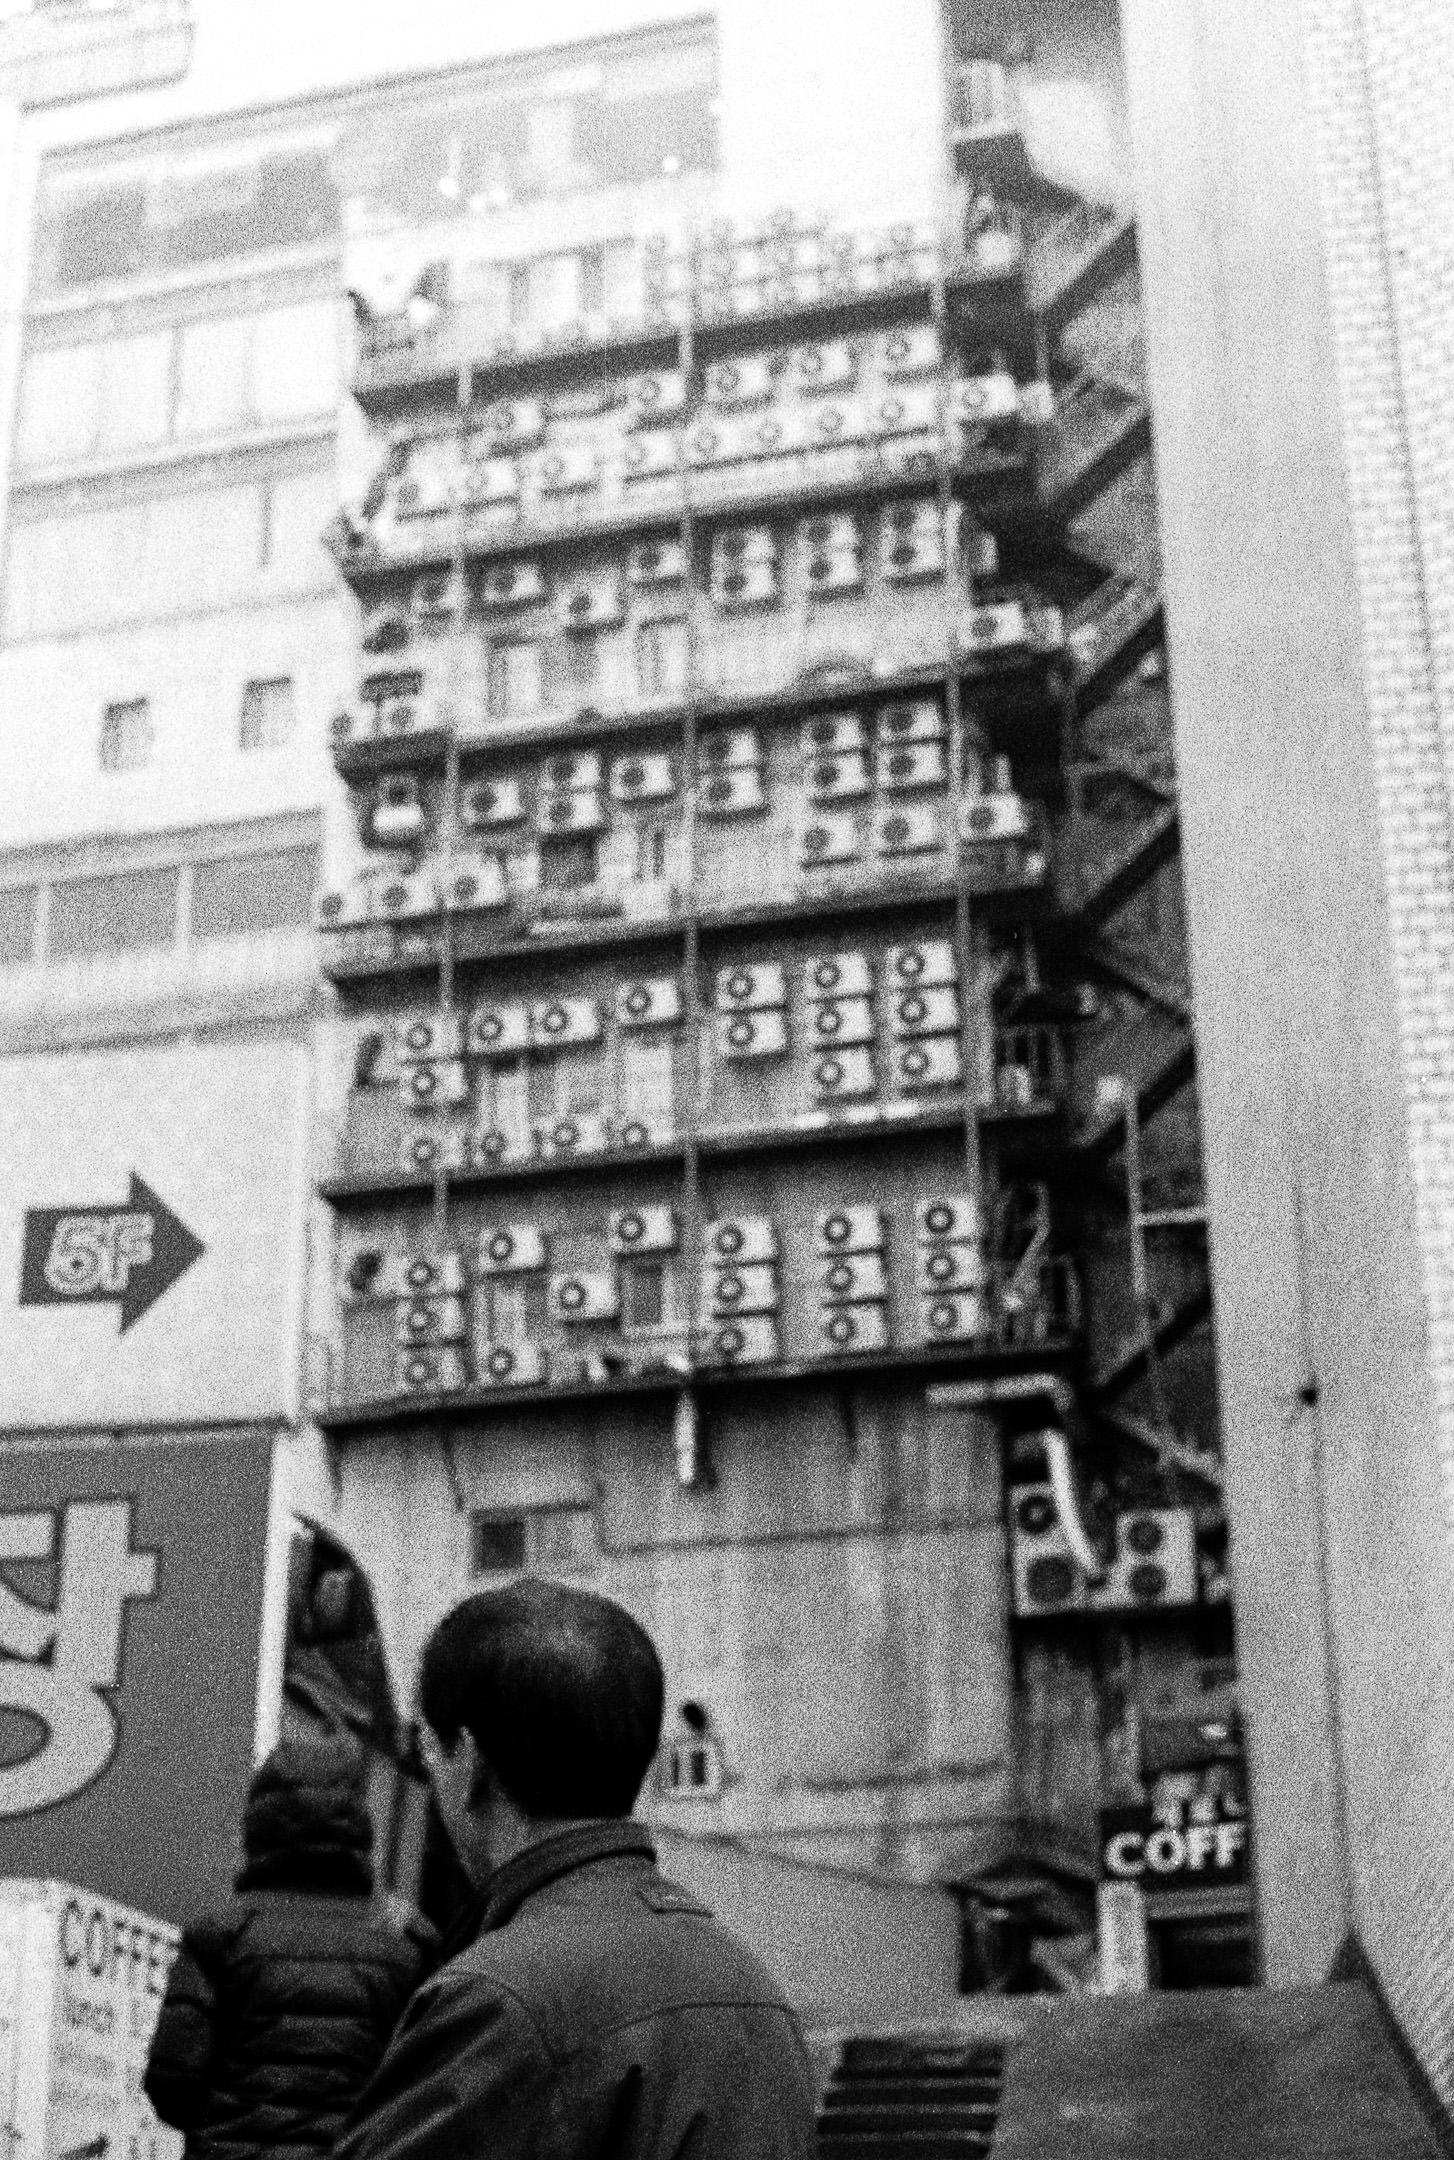 09-streetasiafilm-003.jpg